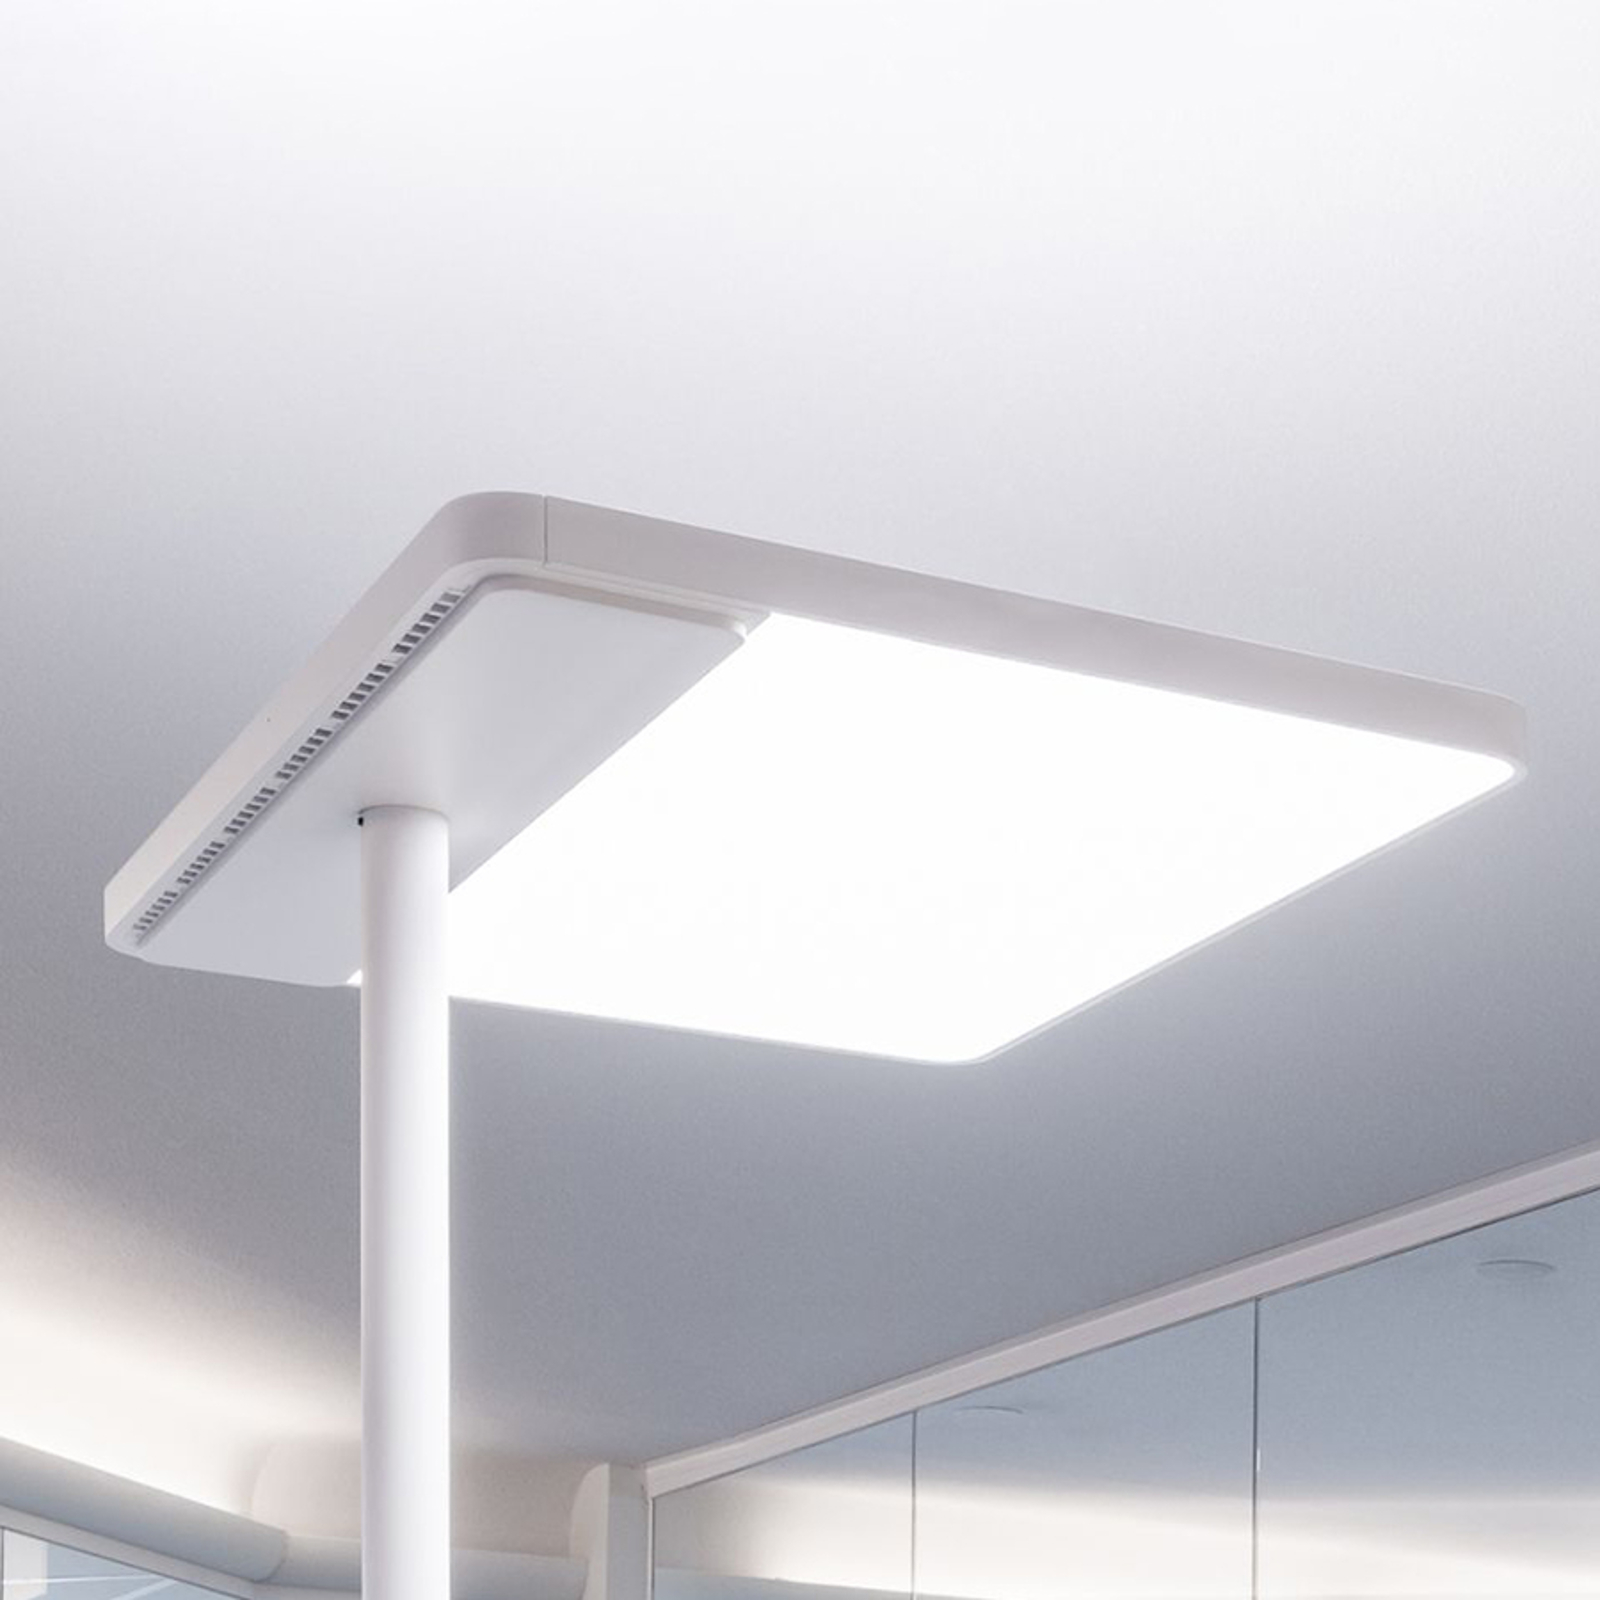 LED kantoor vloerlamp Linea-F met tastdimmer